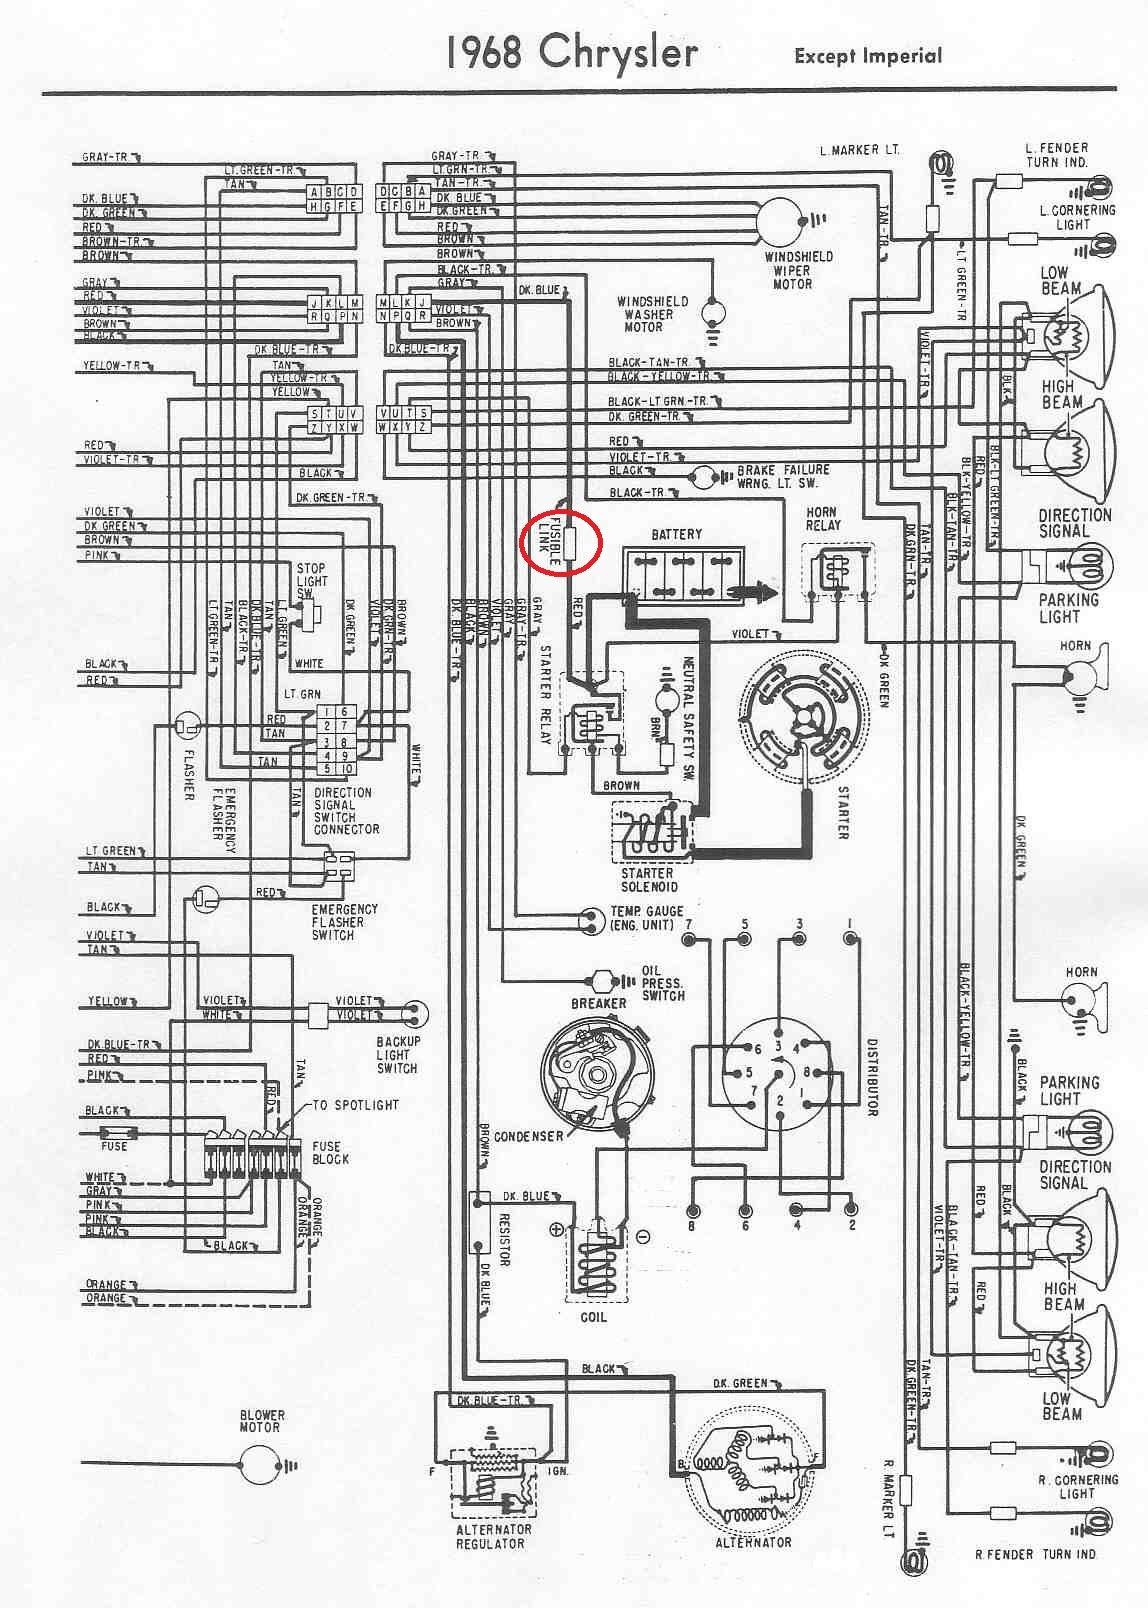 72 dodge wiring harness diagram image 3